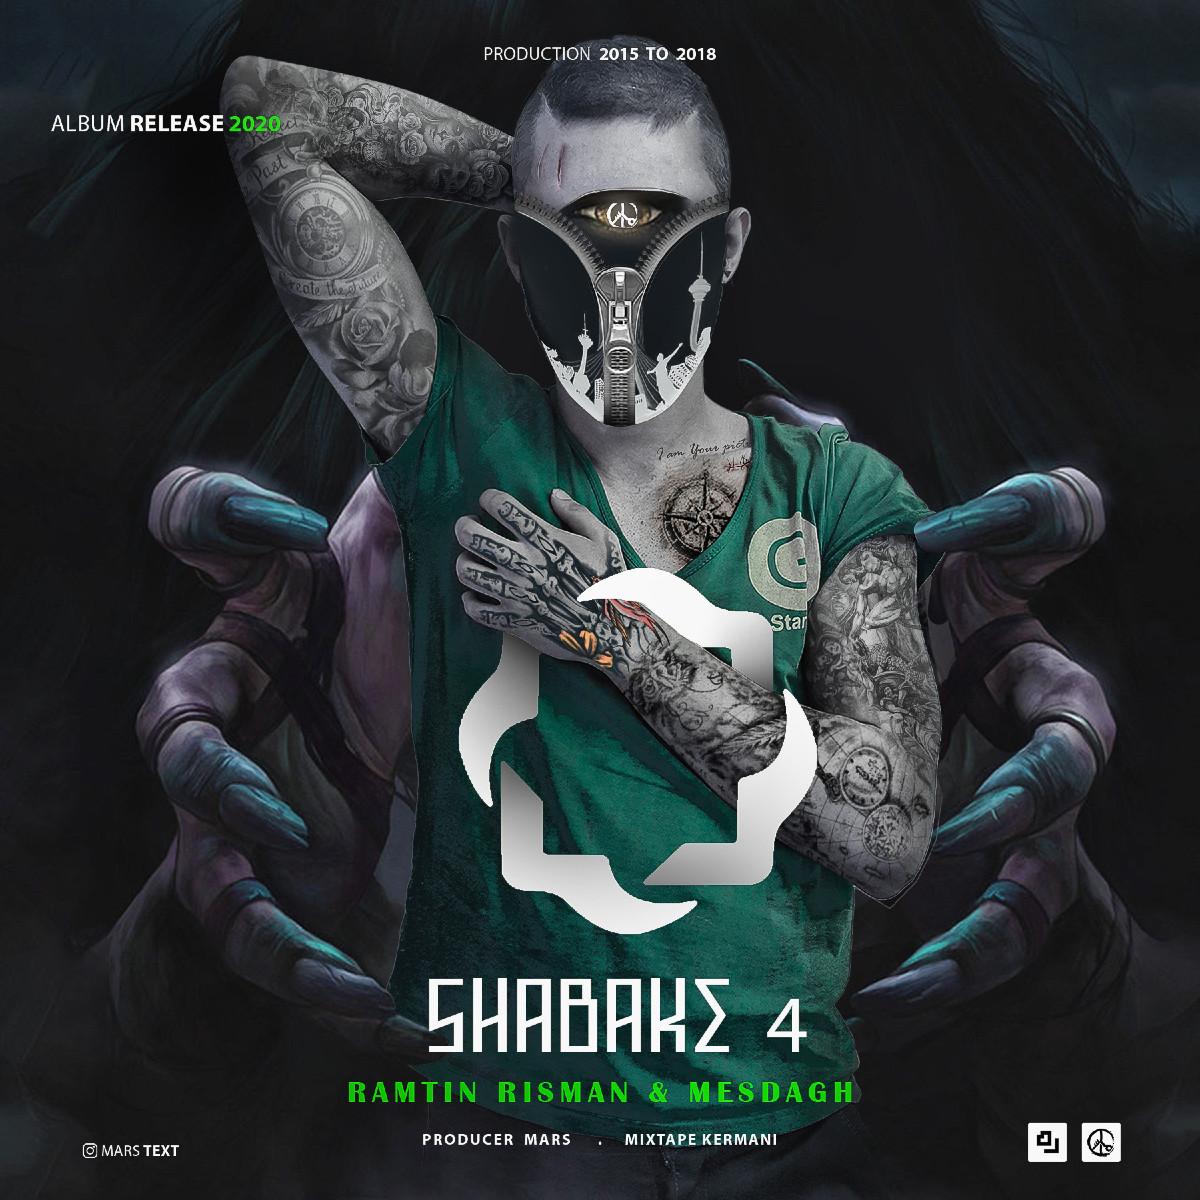 Ramtin Risman & Mesdagh - Shabake 4